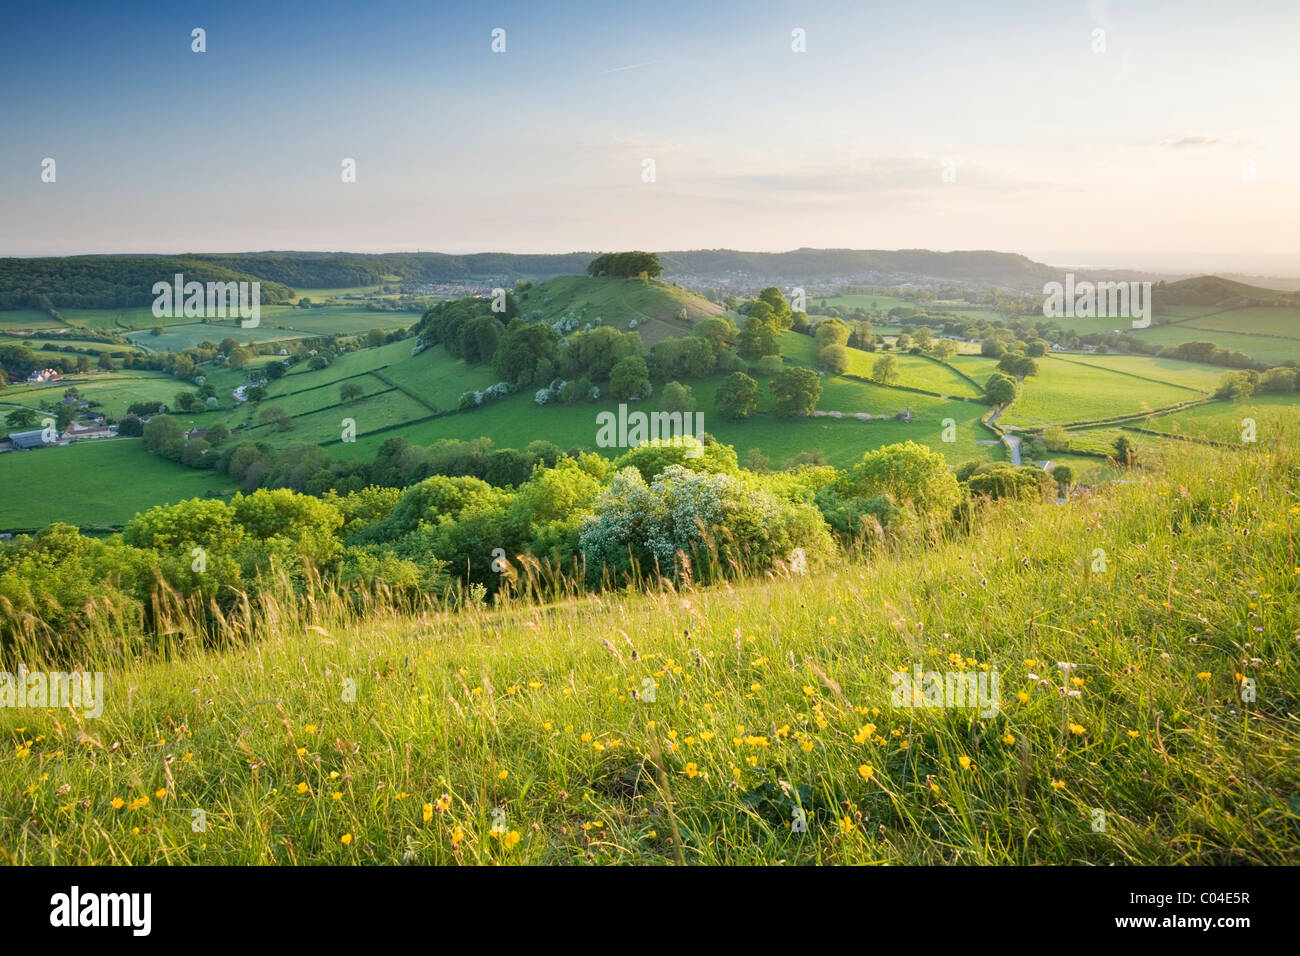 Downham Hill from Uley Bury. The Cotswolds. Gloucestershire. England. UK. Stock Photo